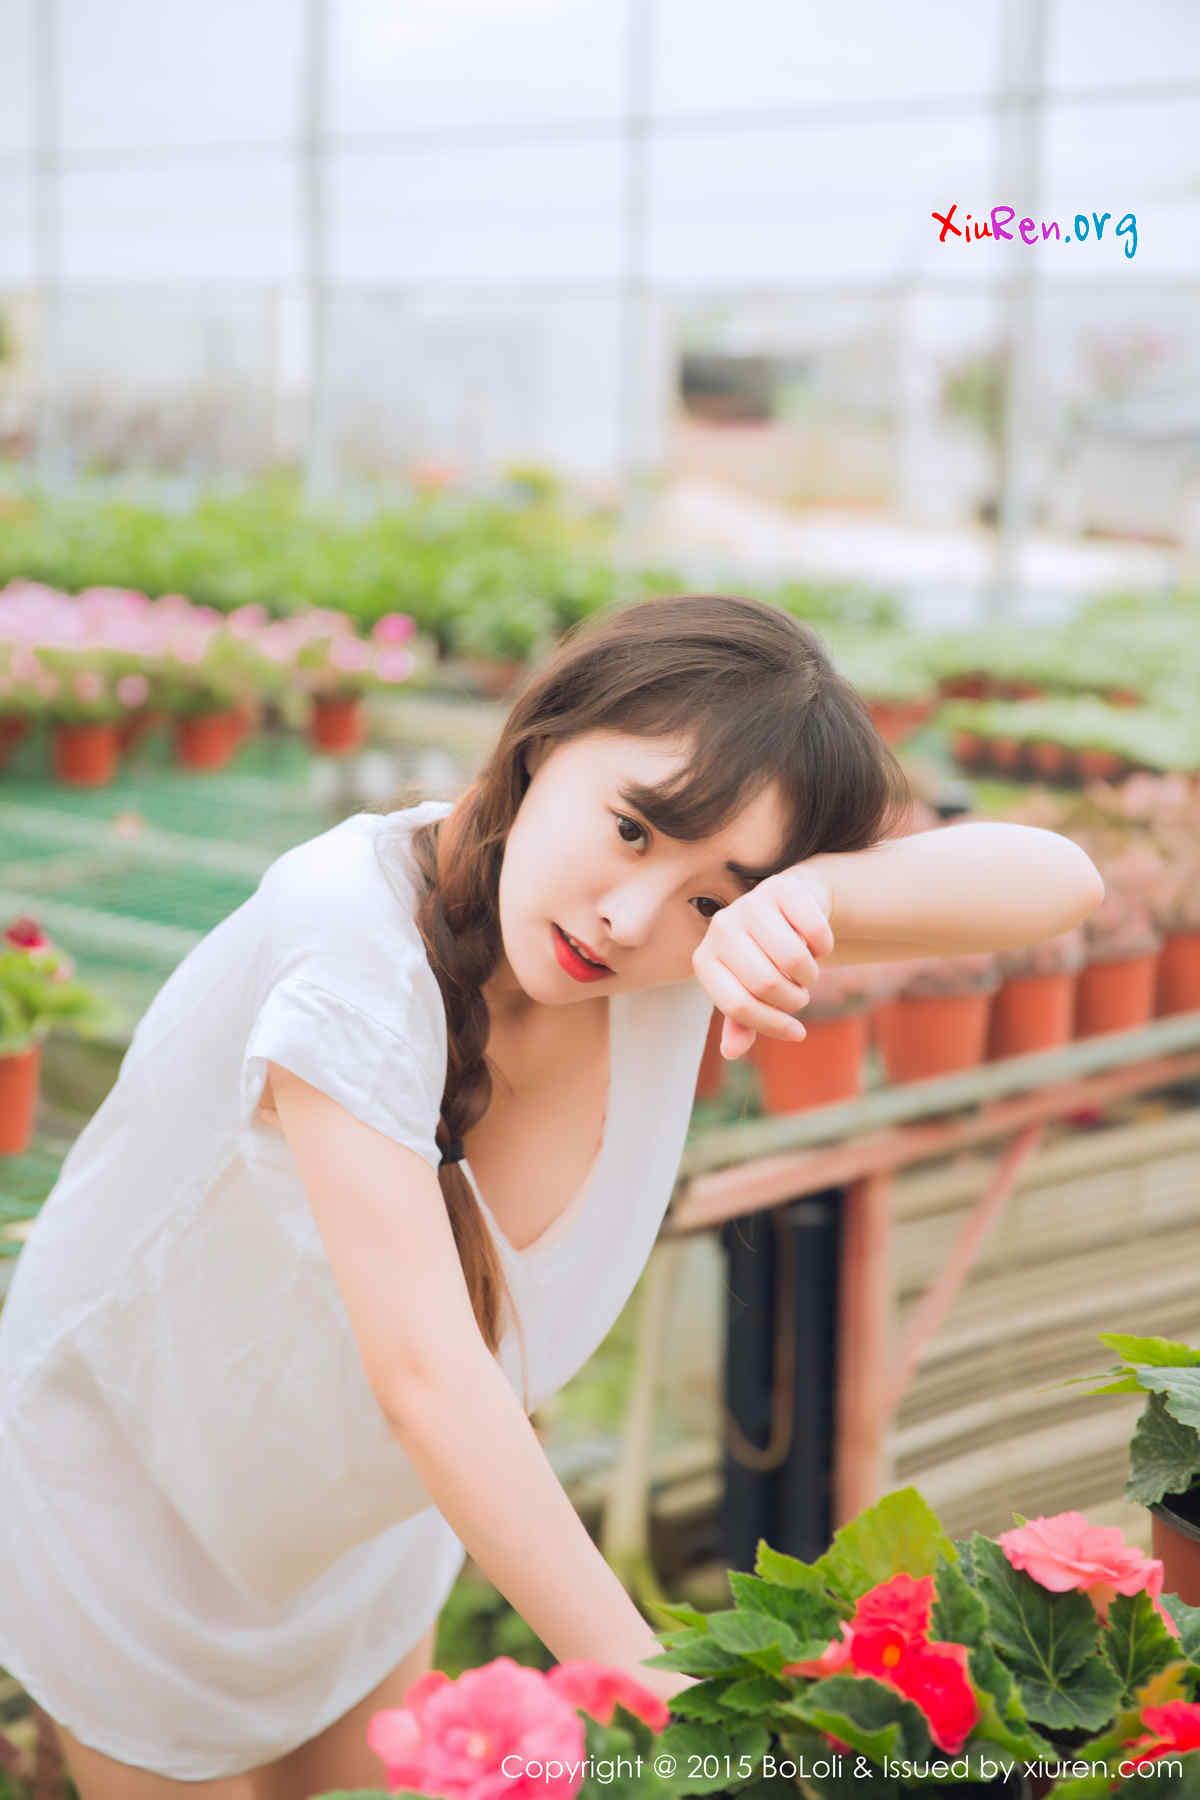 PhimVu-Blog-0053.jpg